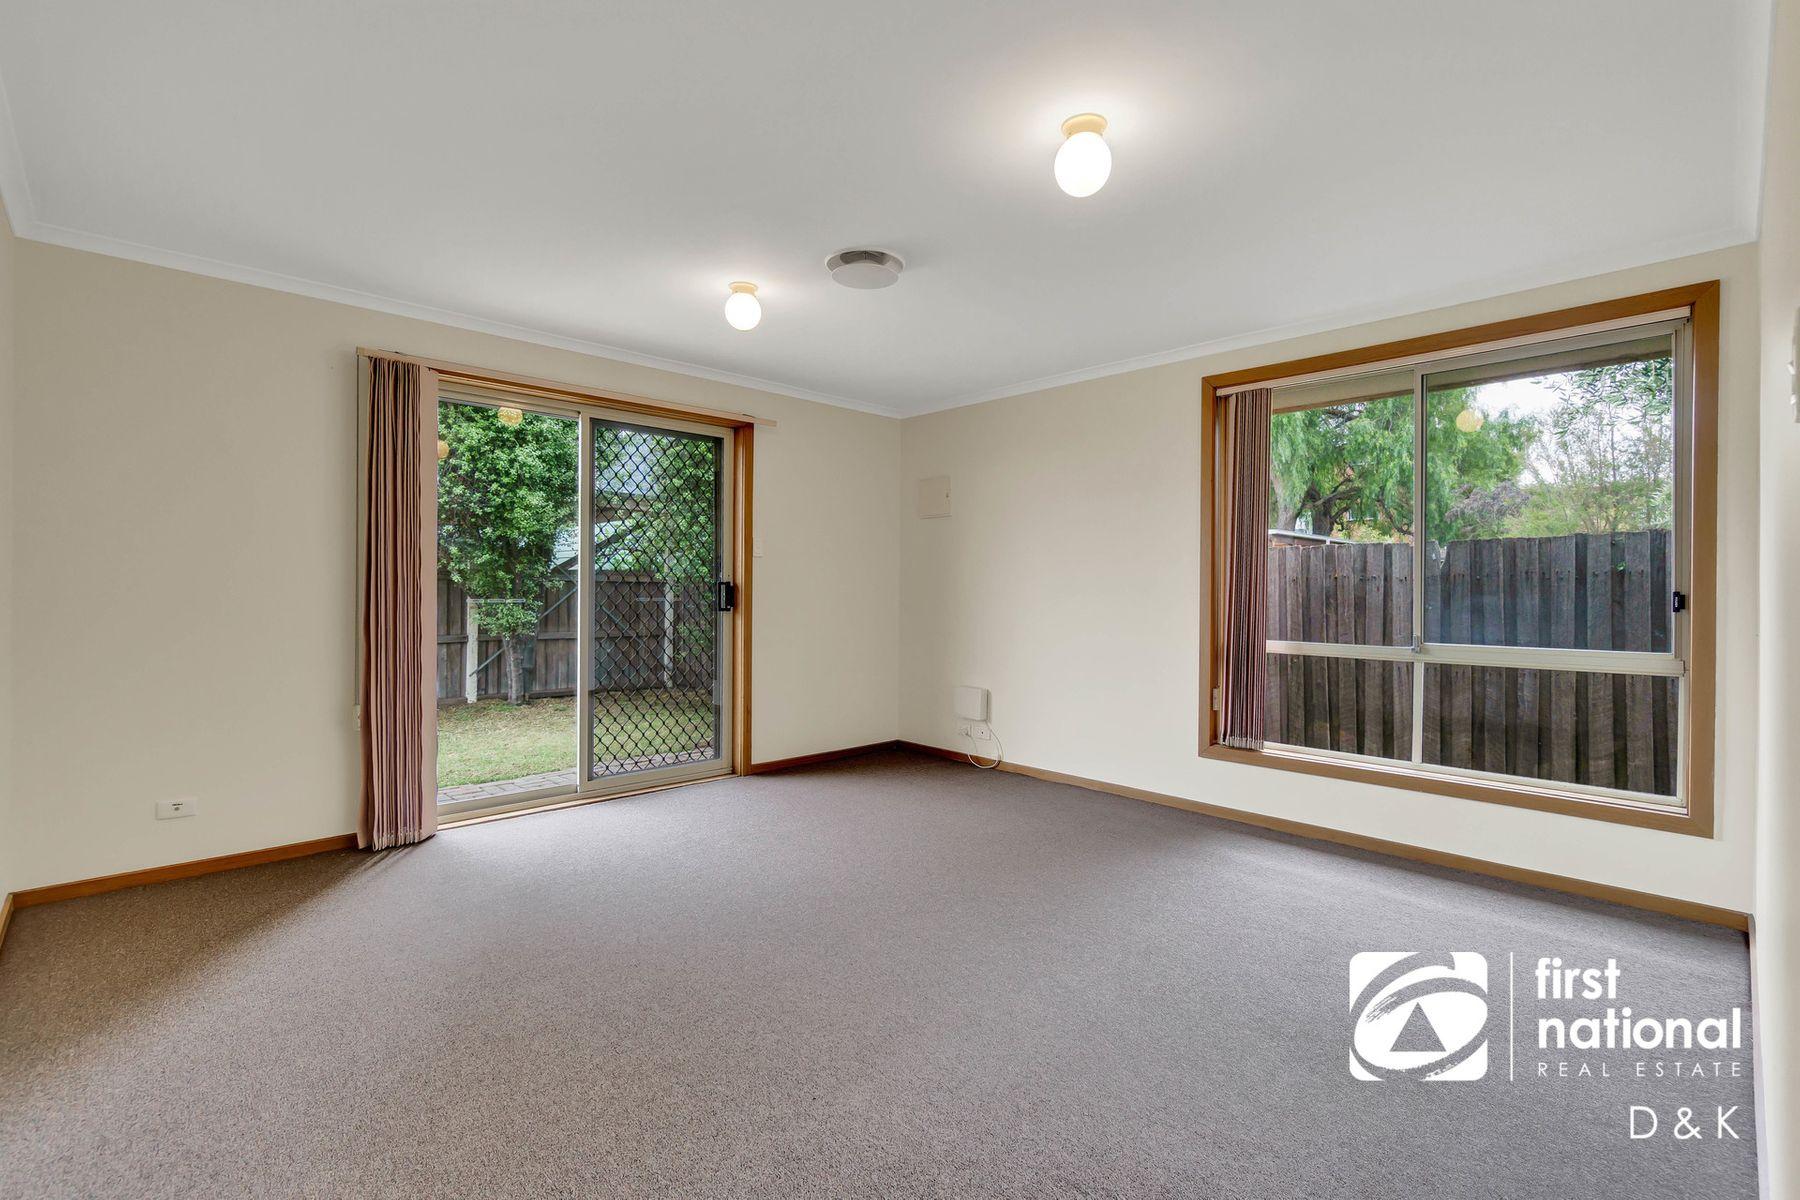 2/113 Cowper Street, Footscray, VIC 3011